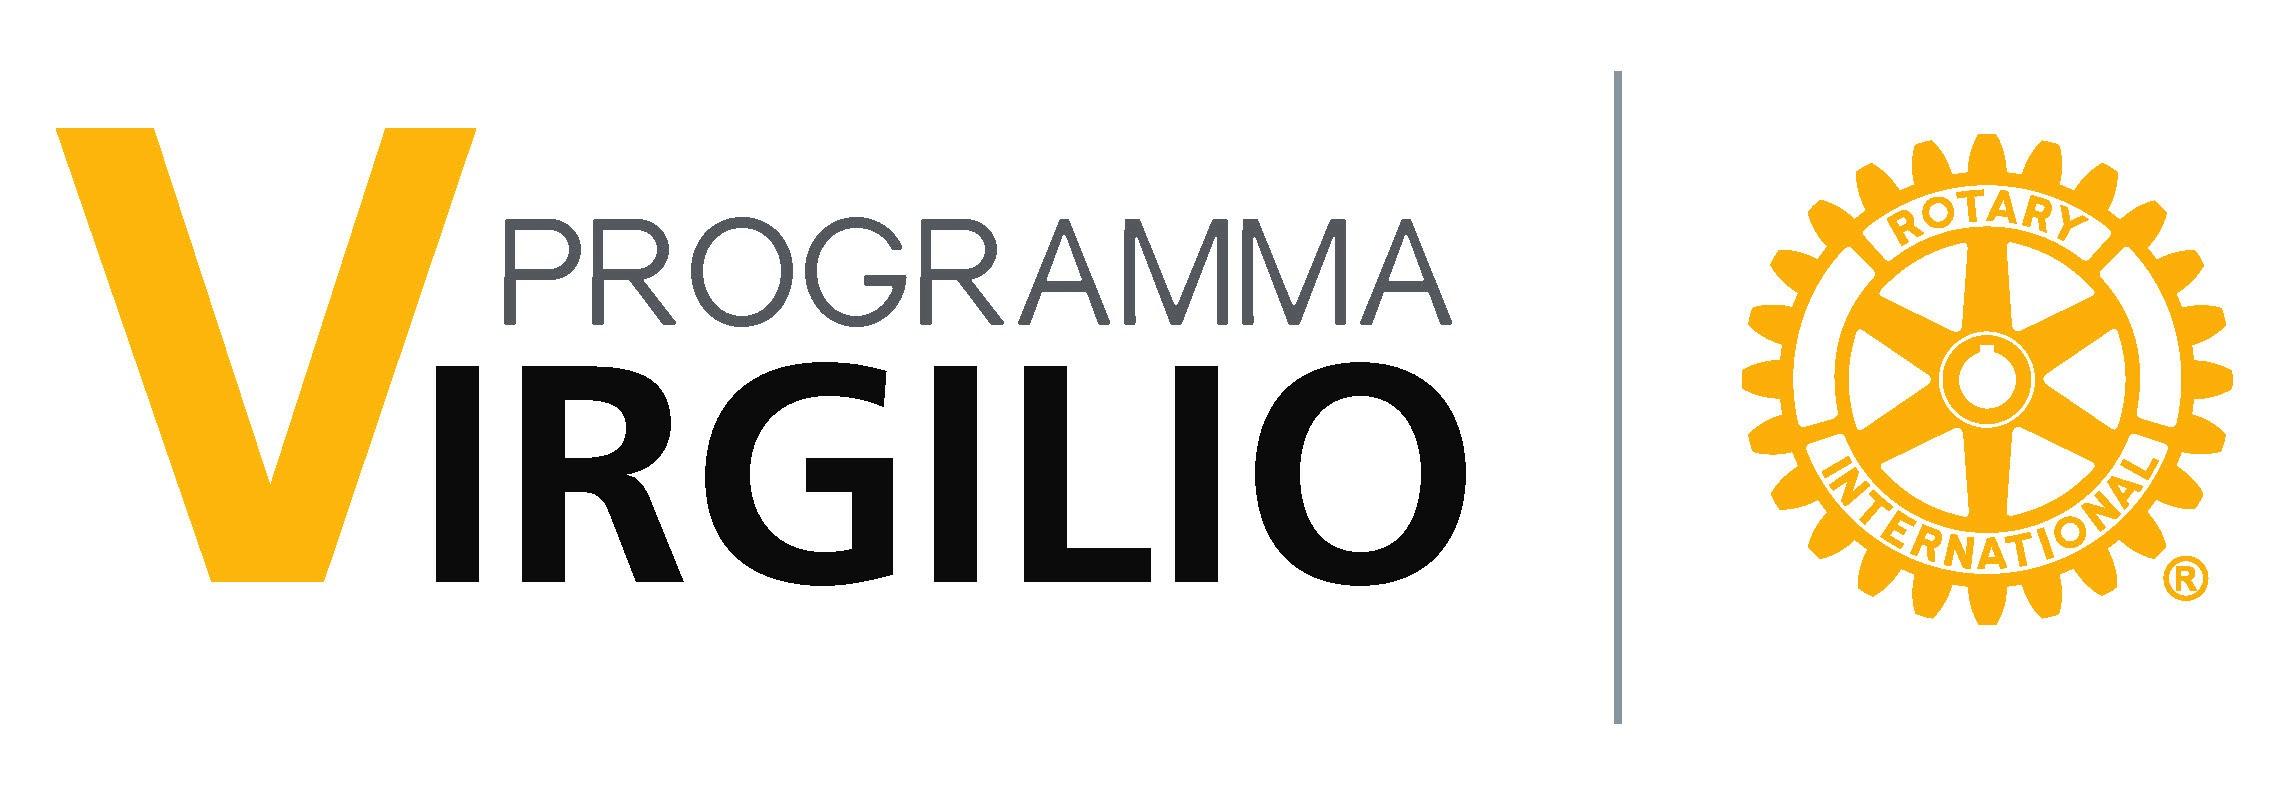 il logo del Programma Virgilio